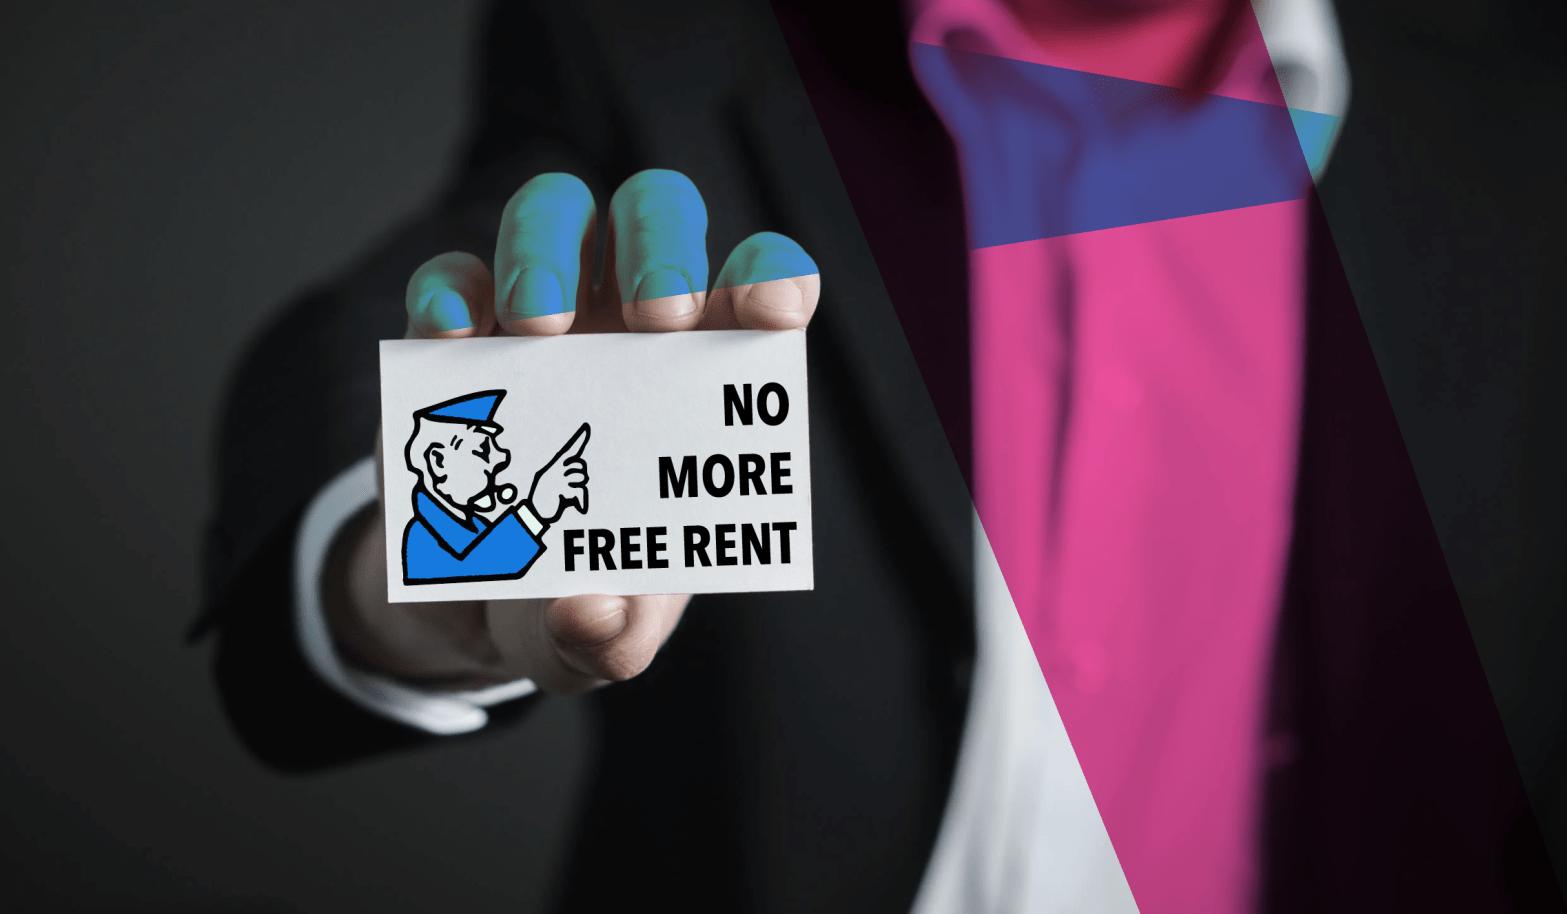 Manhattan Landlords no longer offering free rent